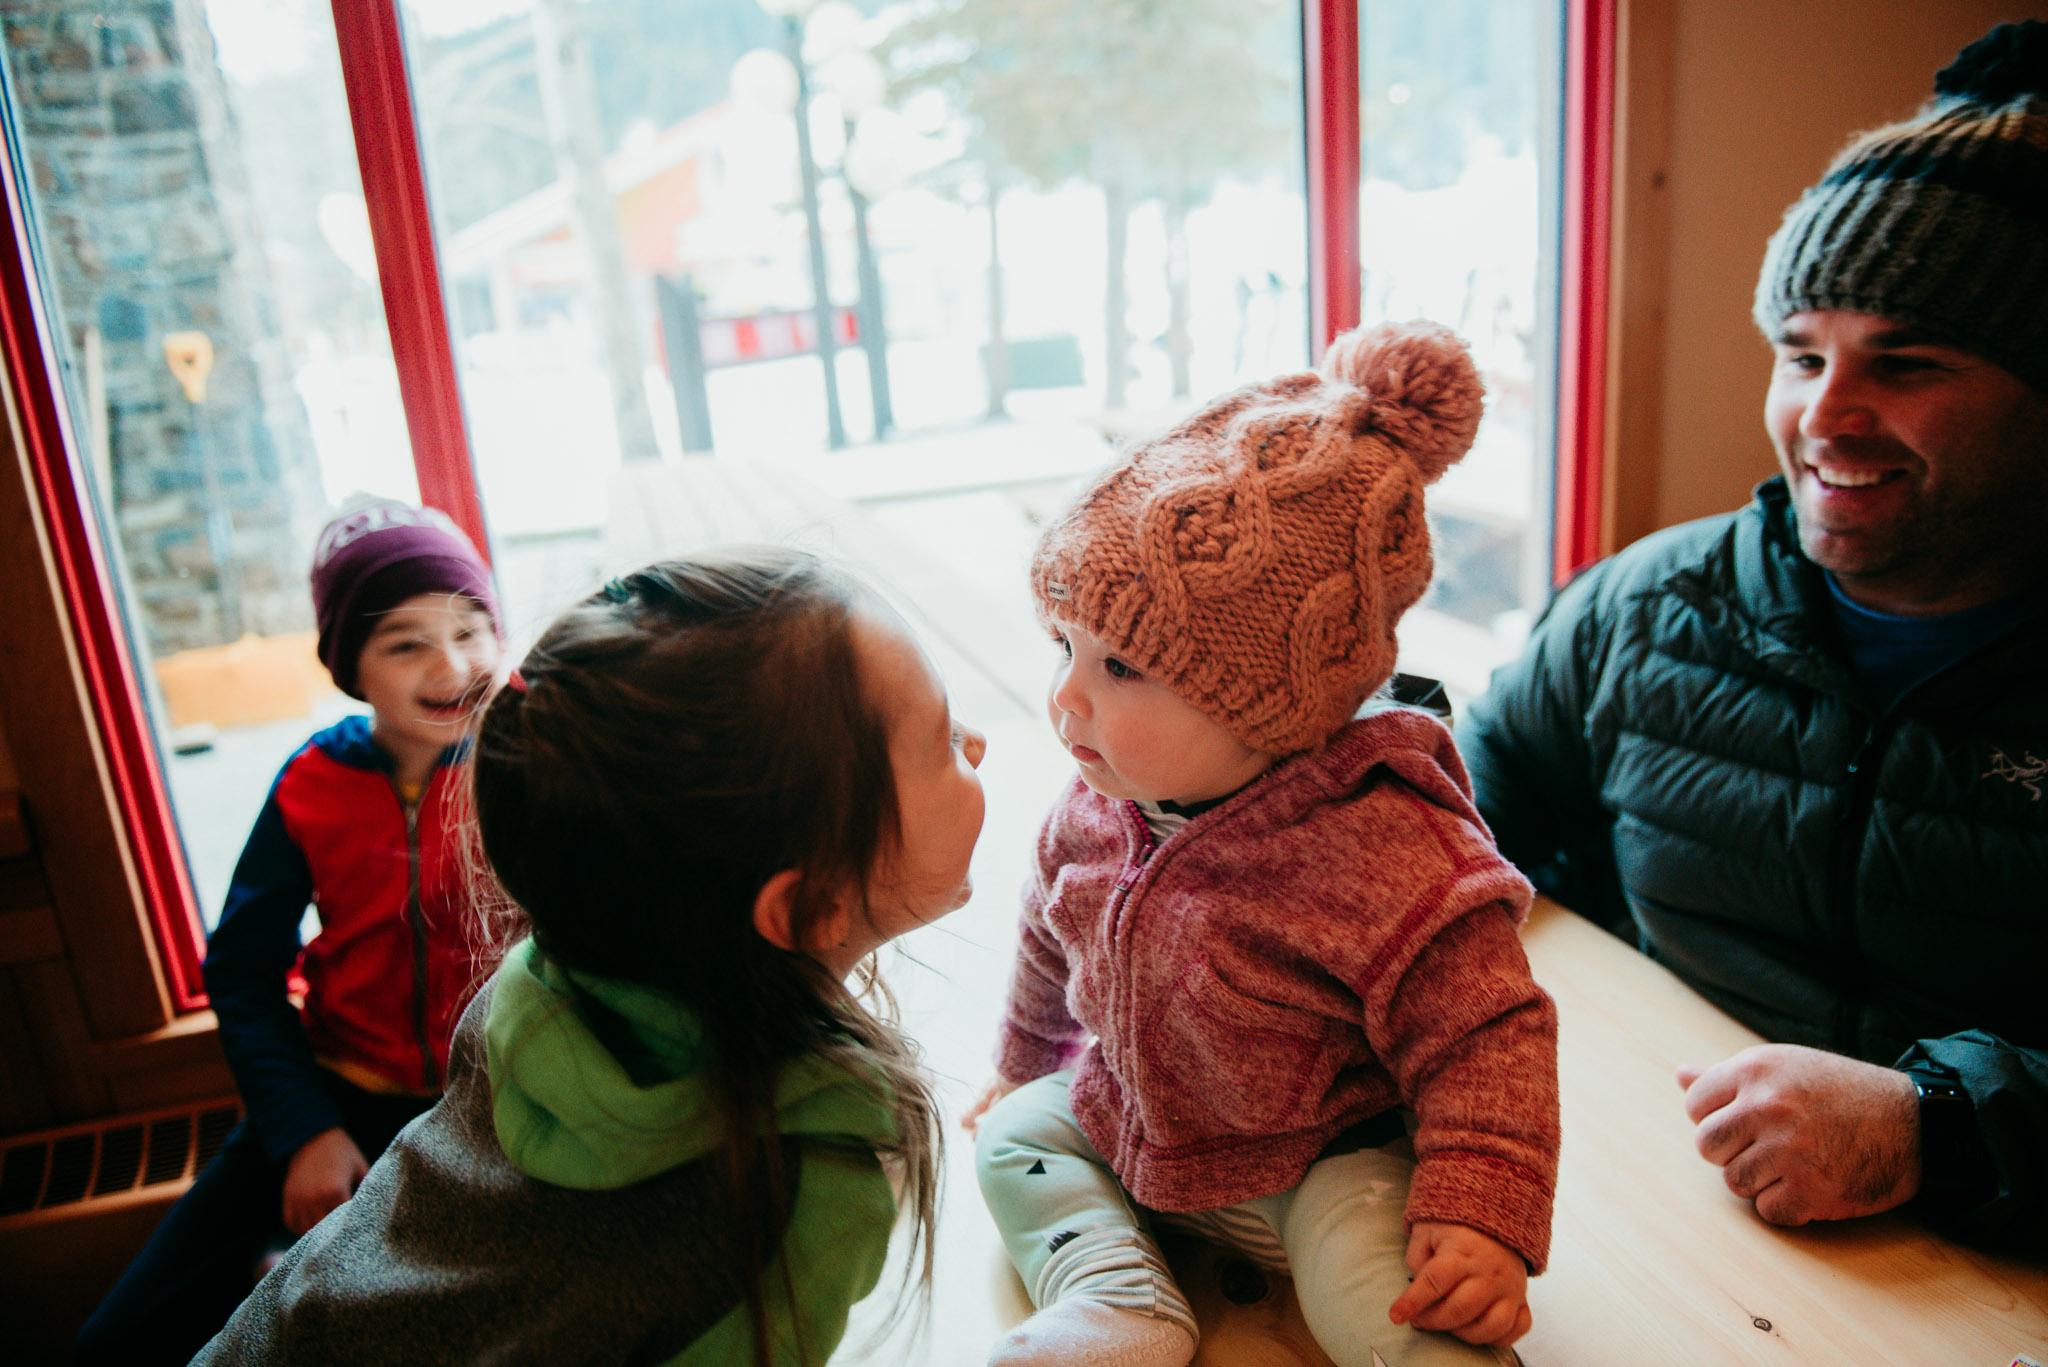 Chelsea Czibere - January 19, 2018 - Nakiska Ski Resort-11.jpg